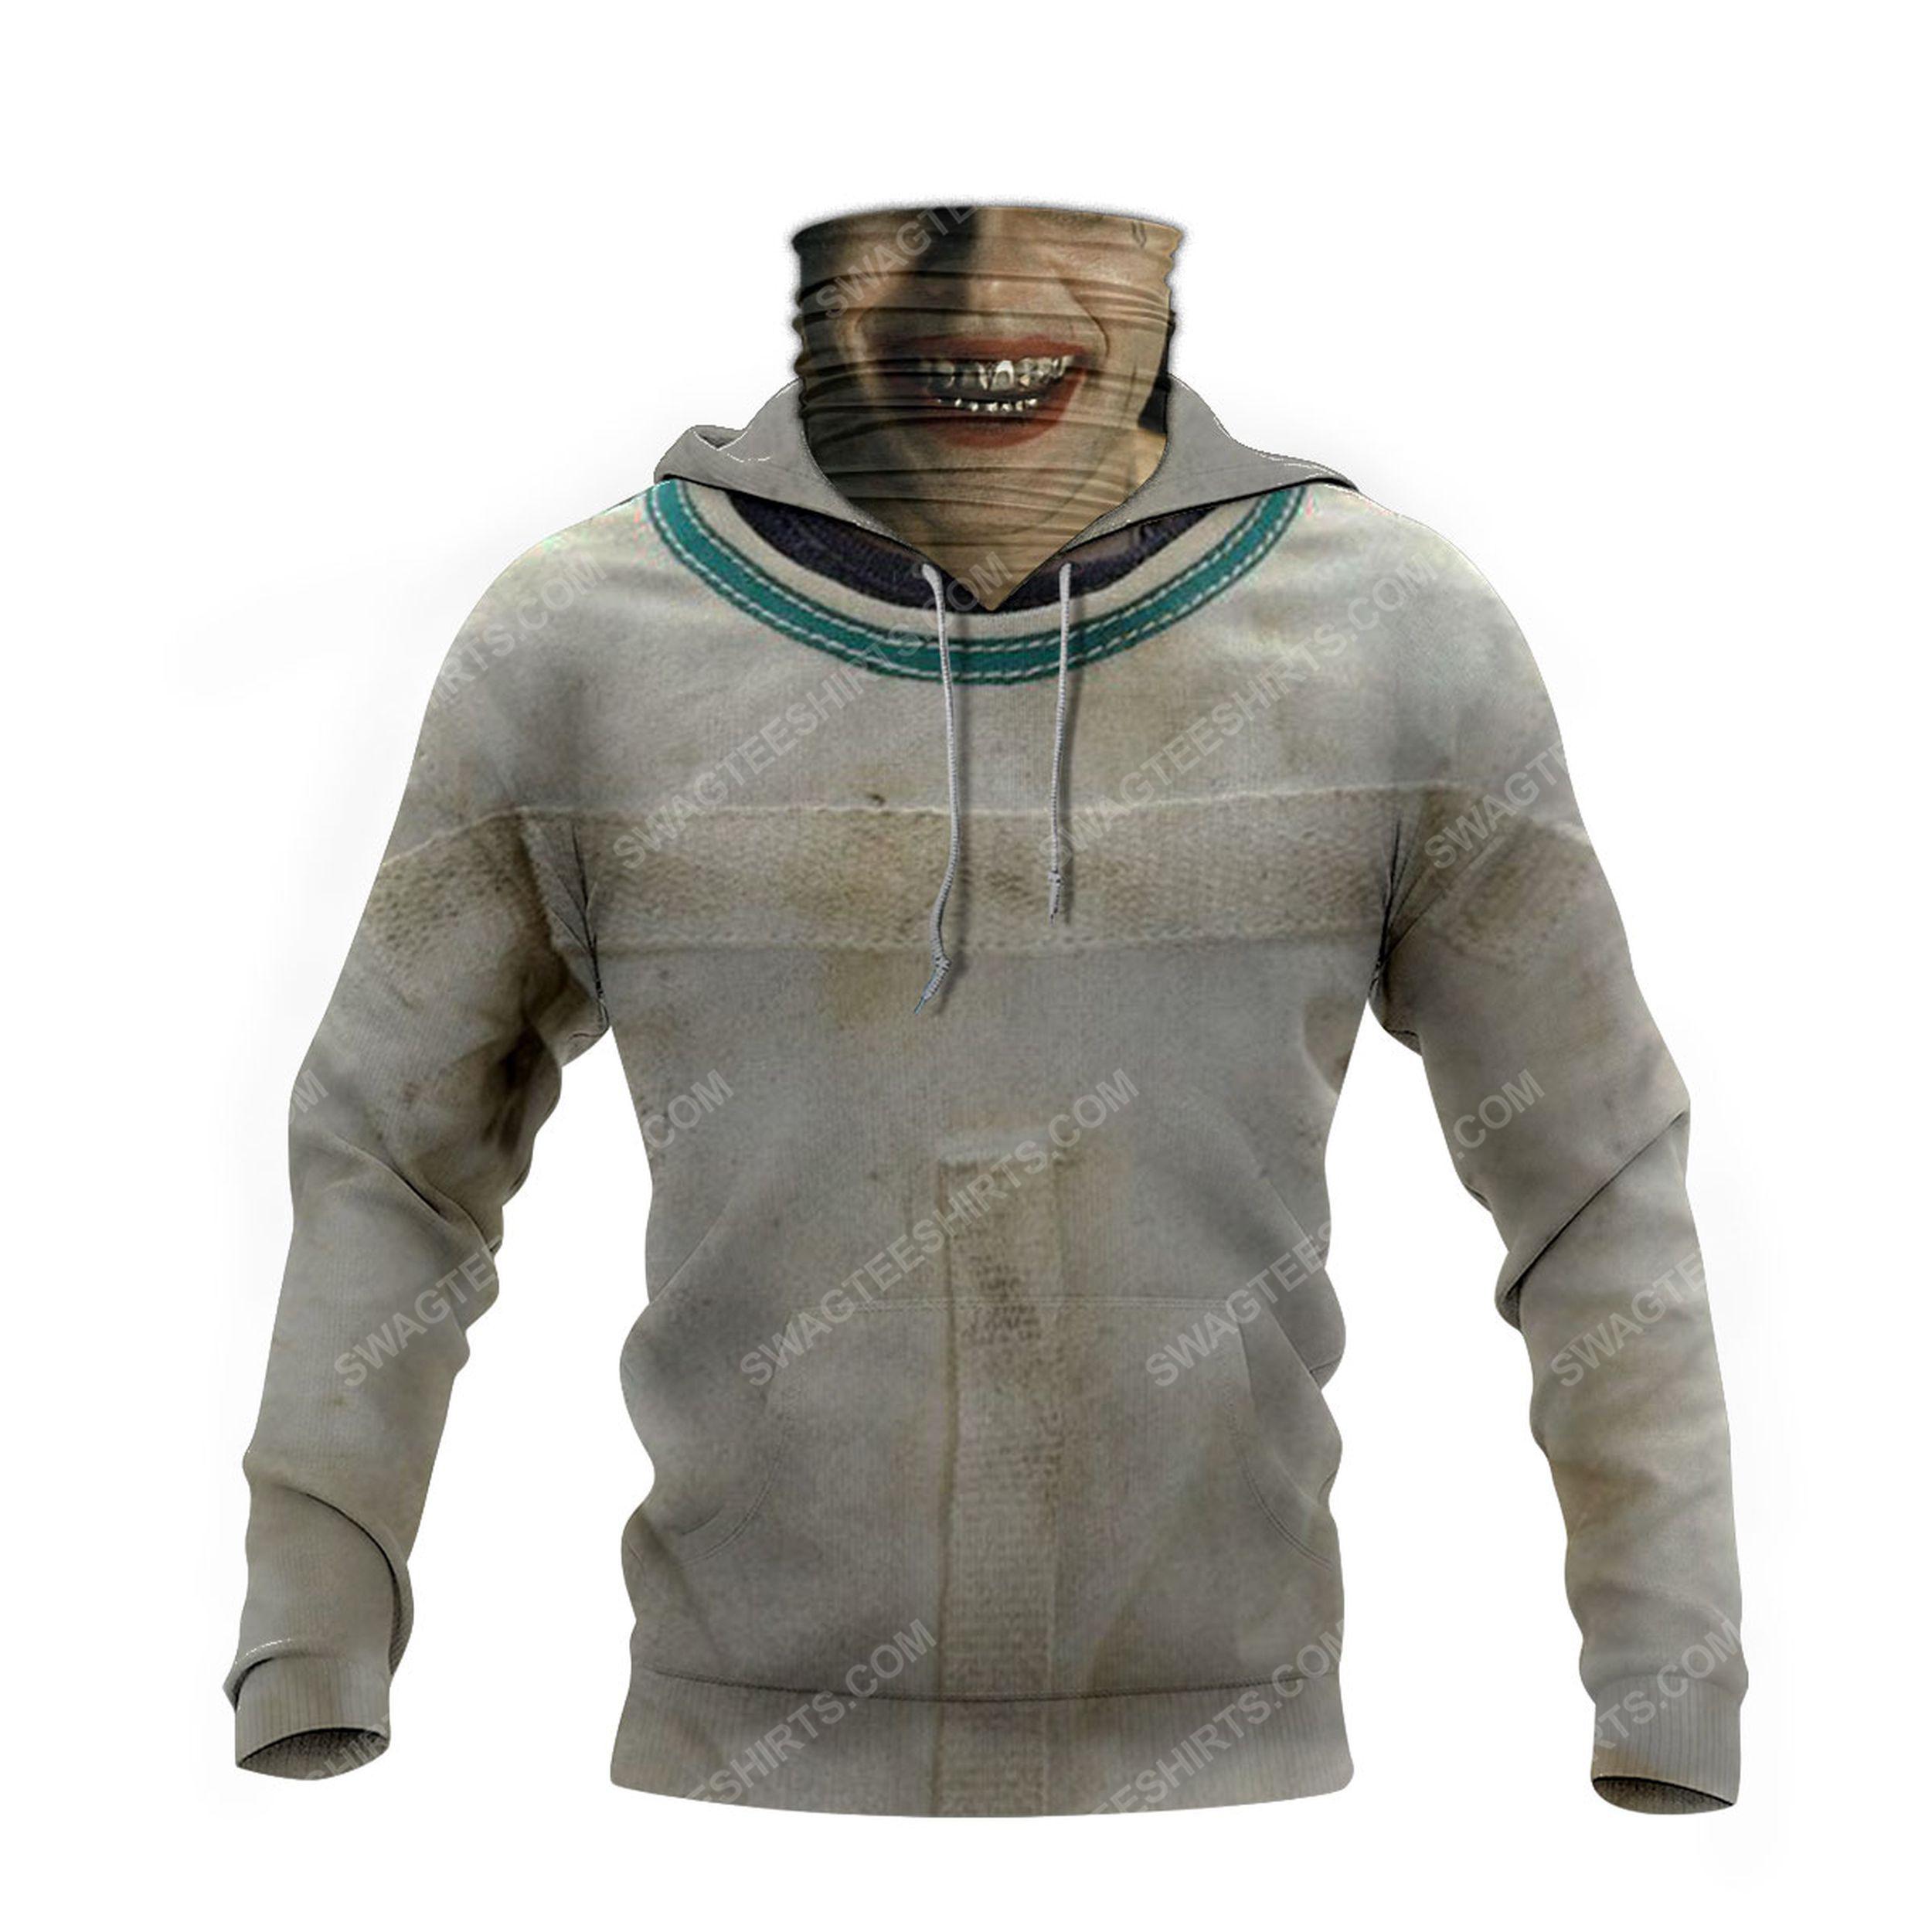 Joker suicide squad full print mask hoodie 4(1)